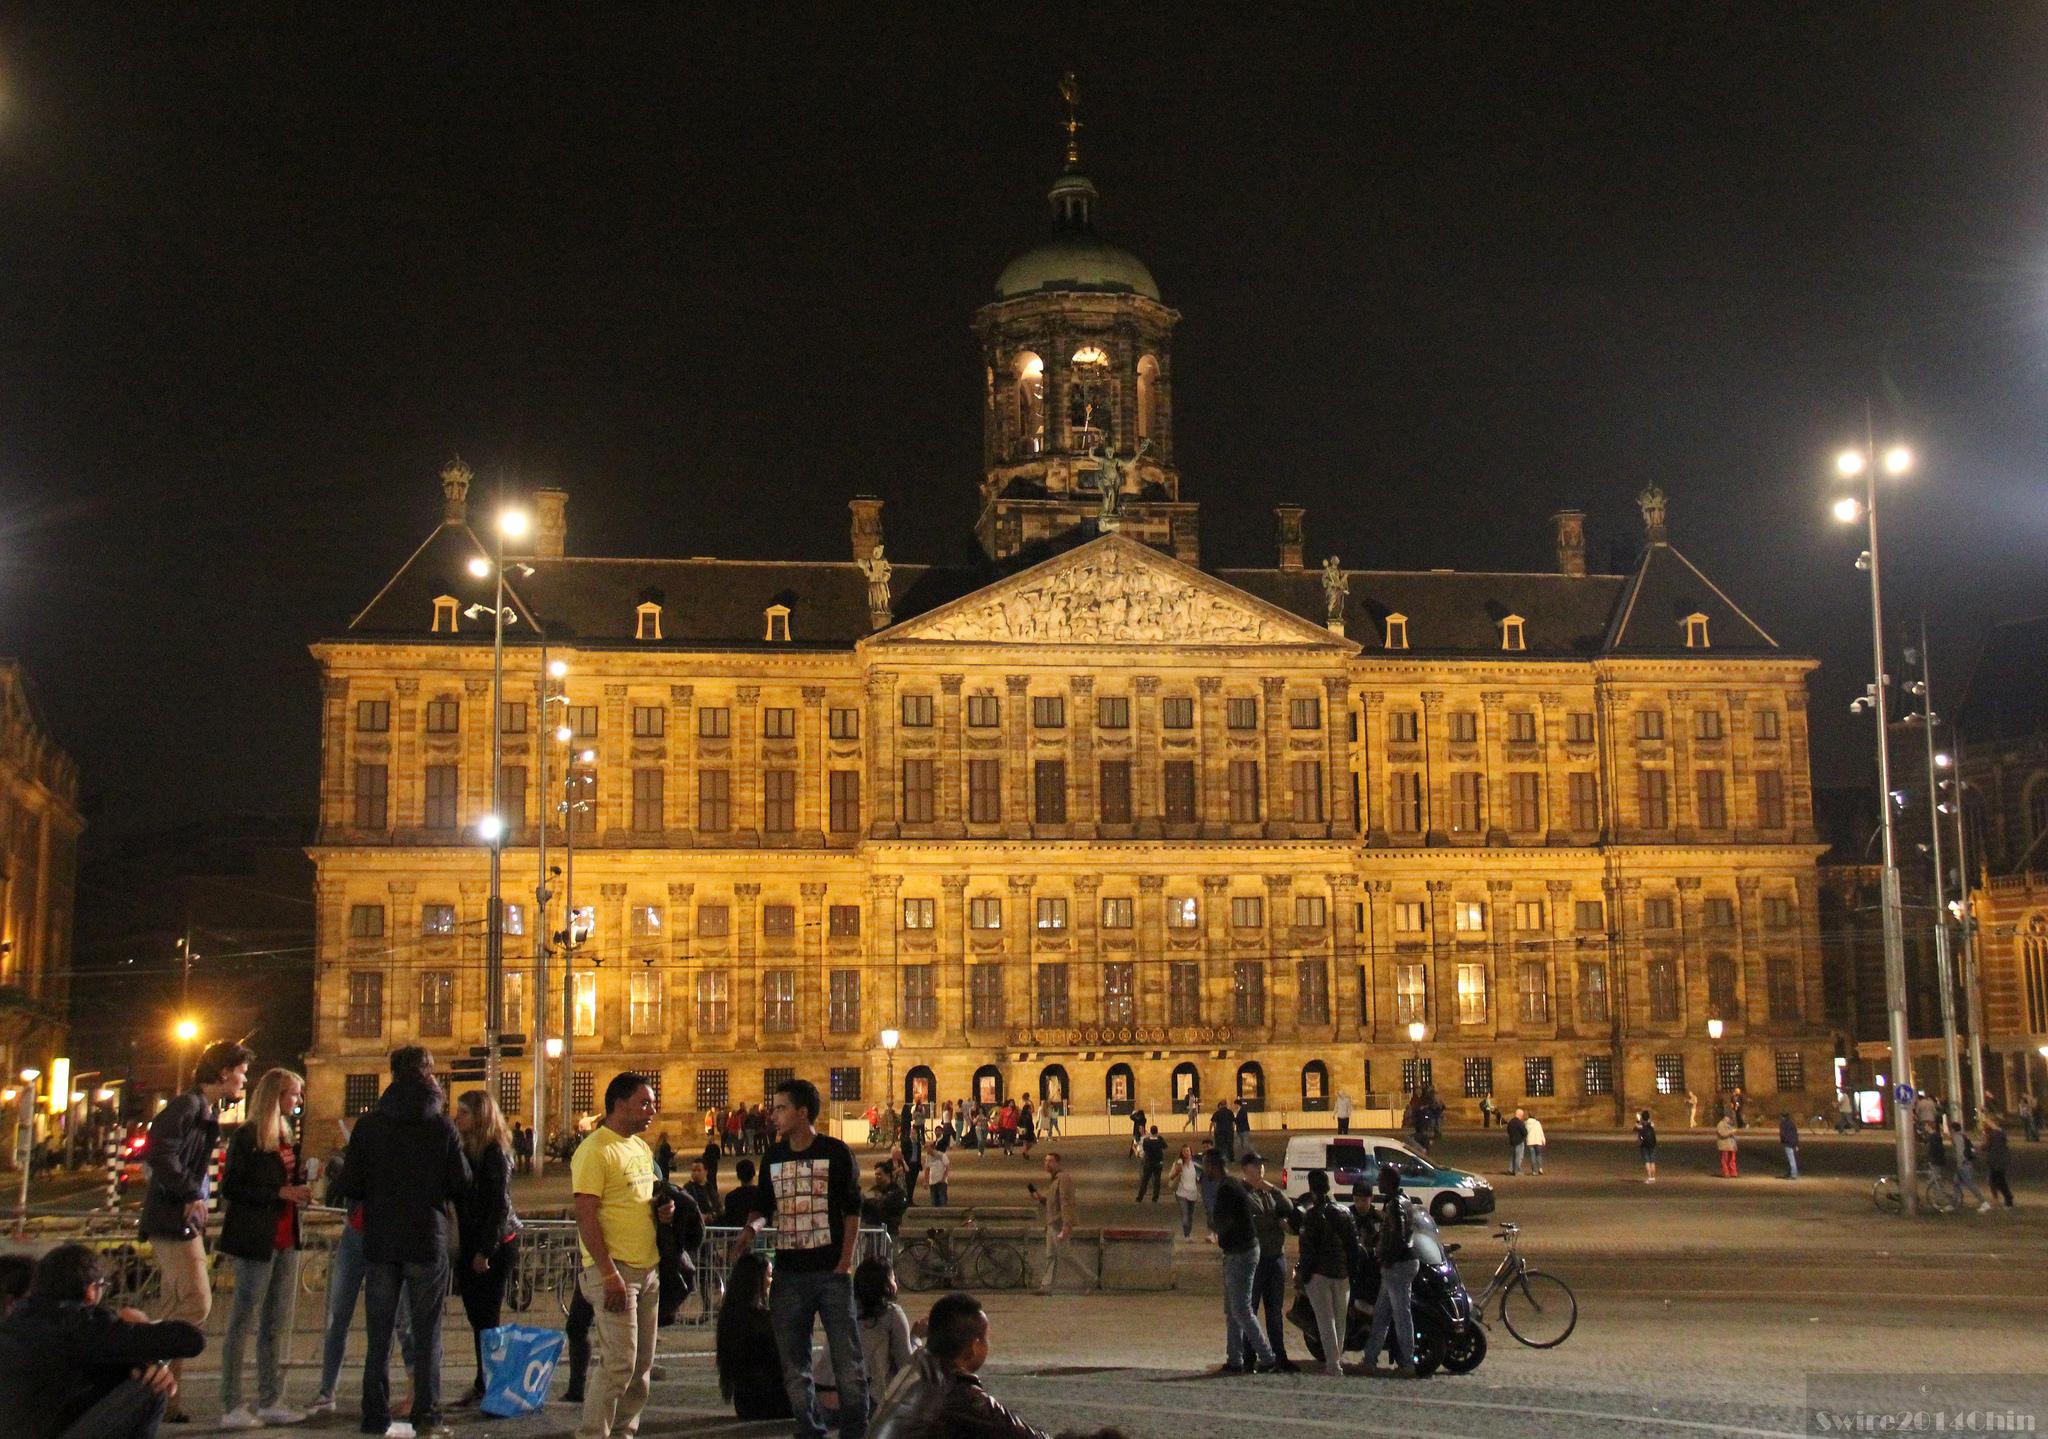 Королевский дворец в Амстердаме, вечер